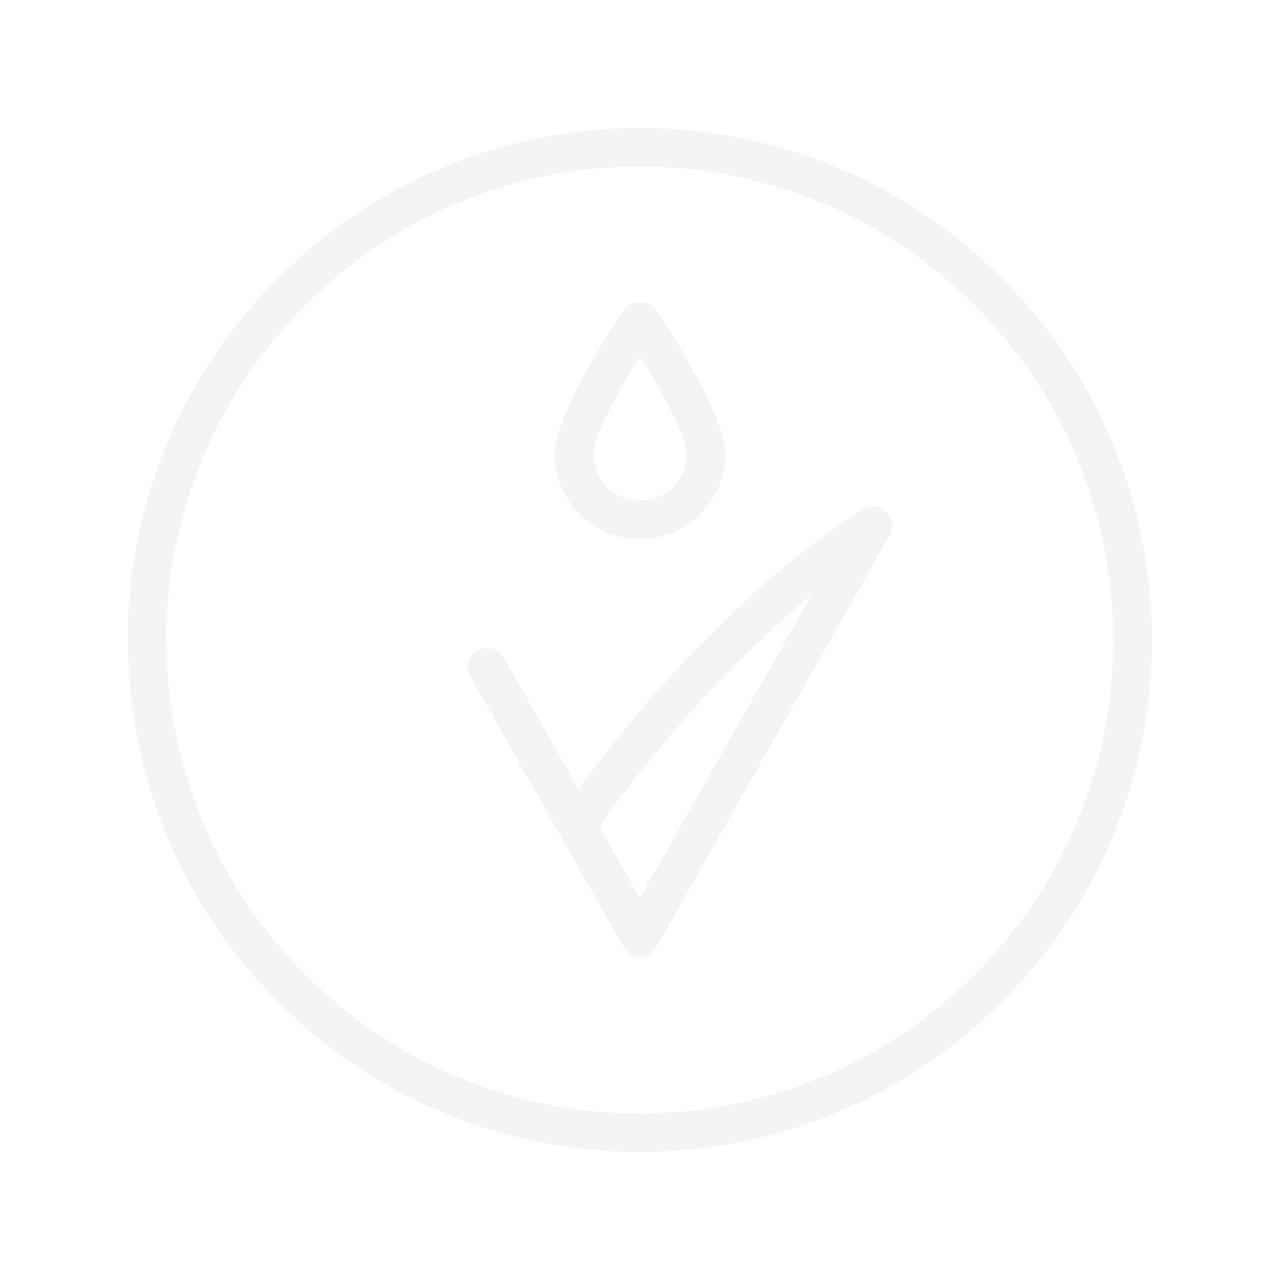 LANCOME Genifique Yeux Eye Illuminator крем для глаз 20ml